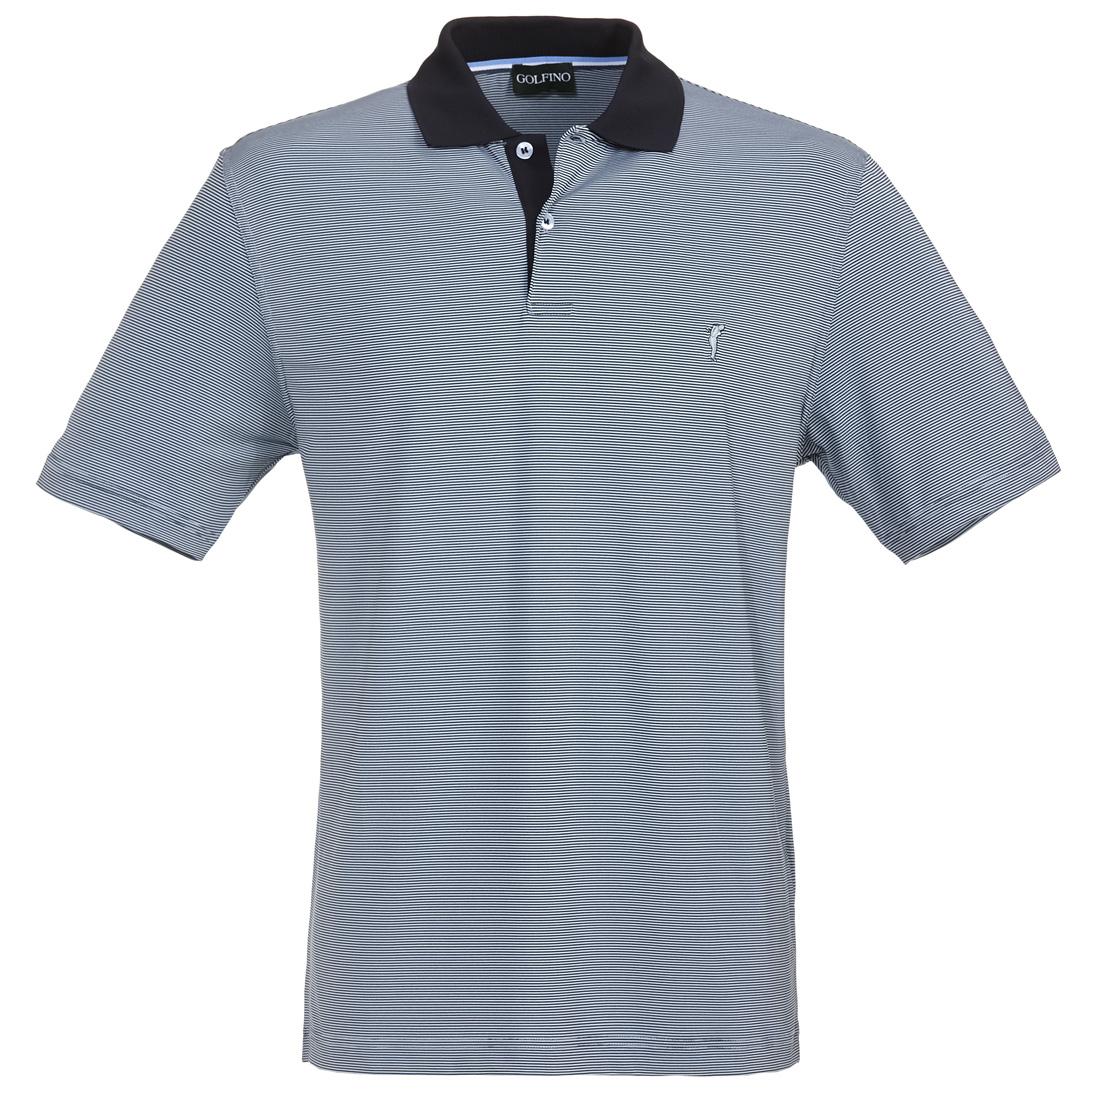 Gestreiftes Herren Golfpoloshirt in Regular Fit